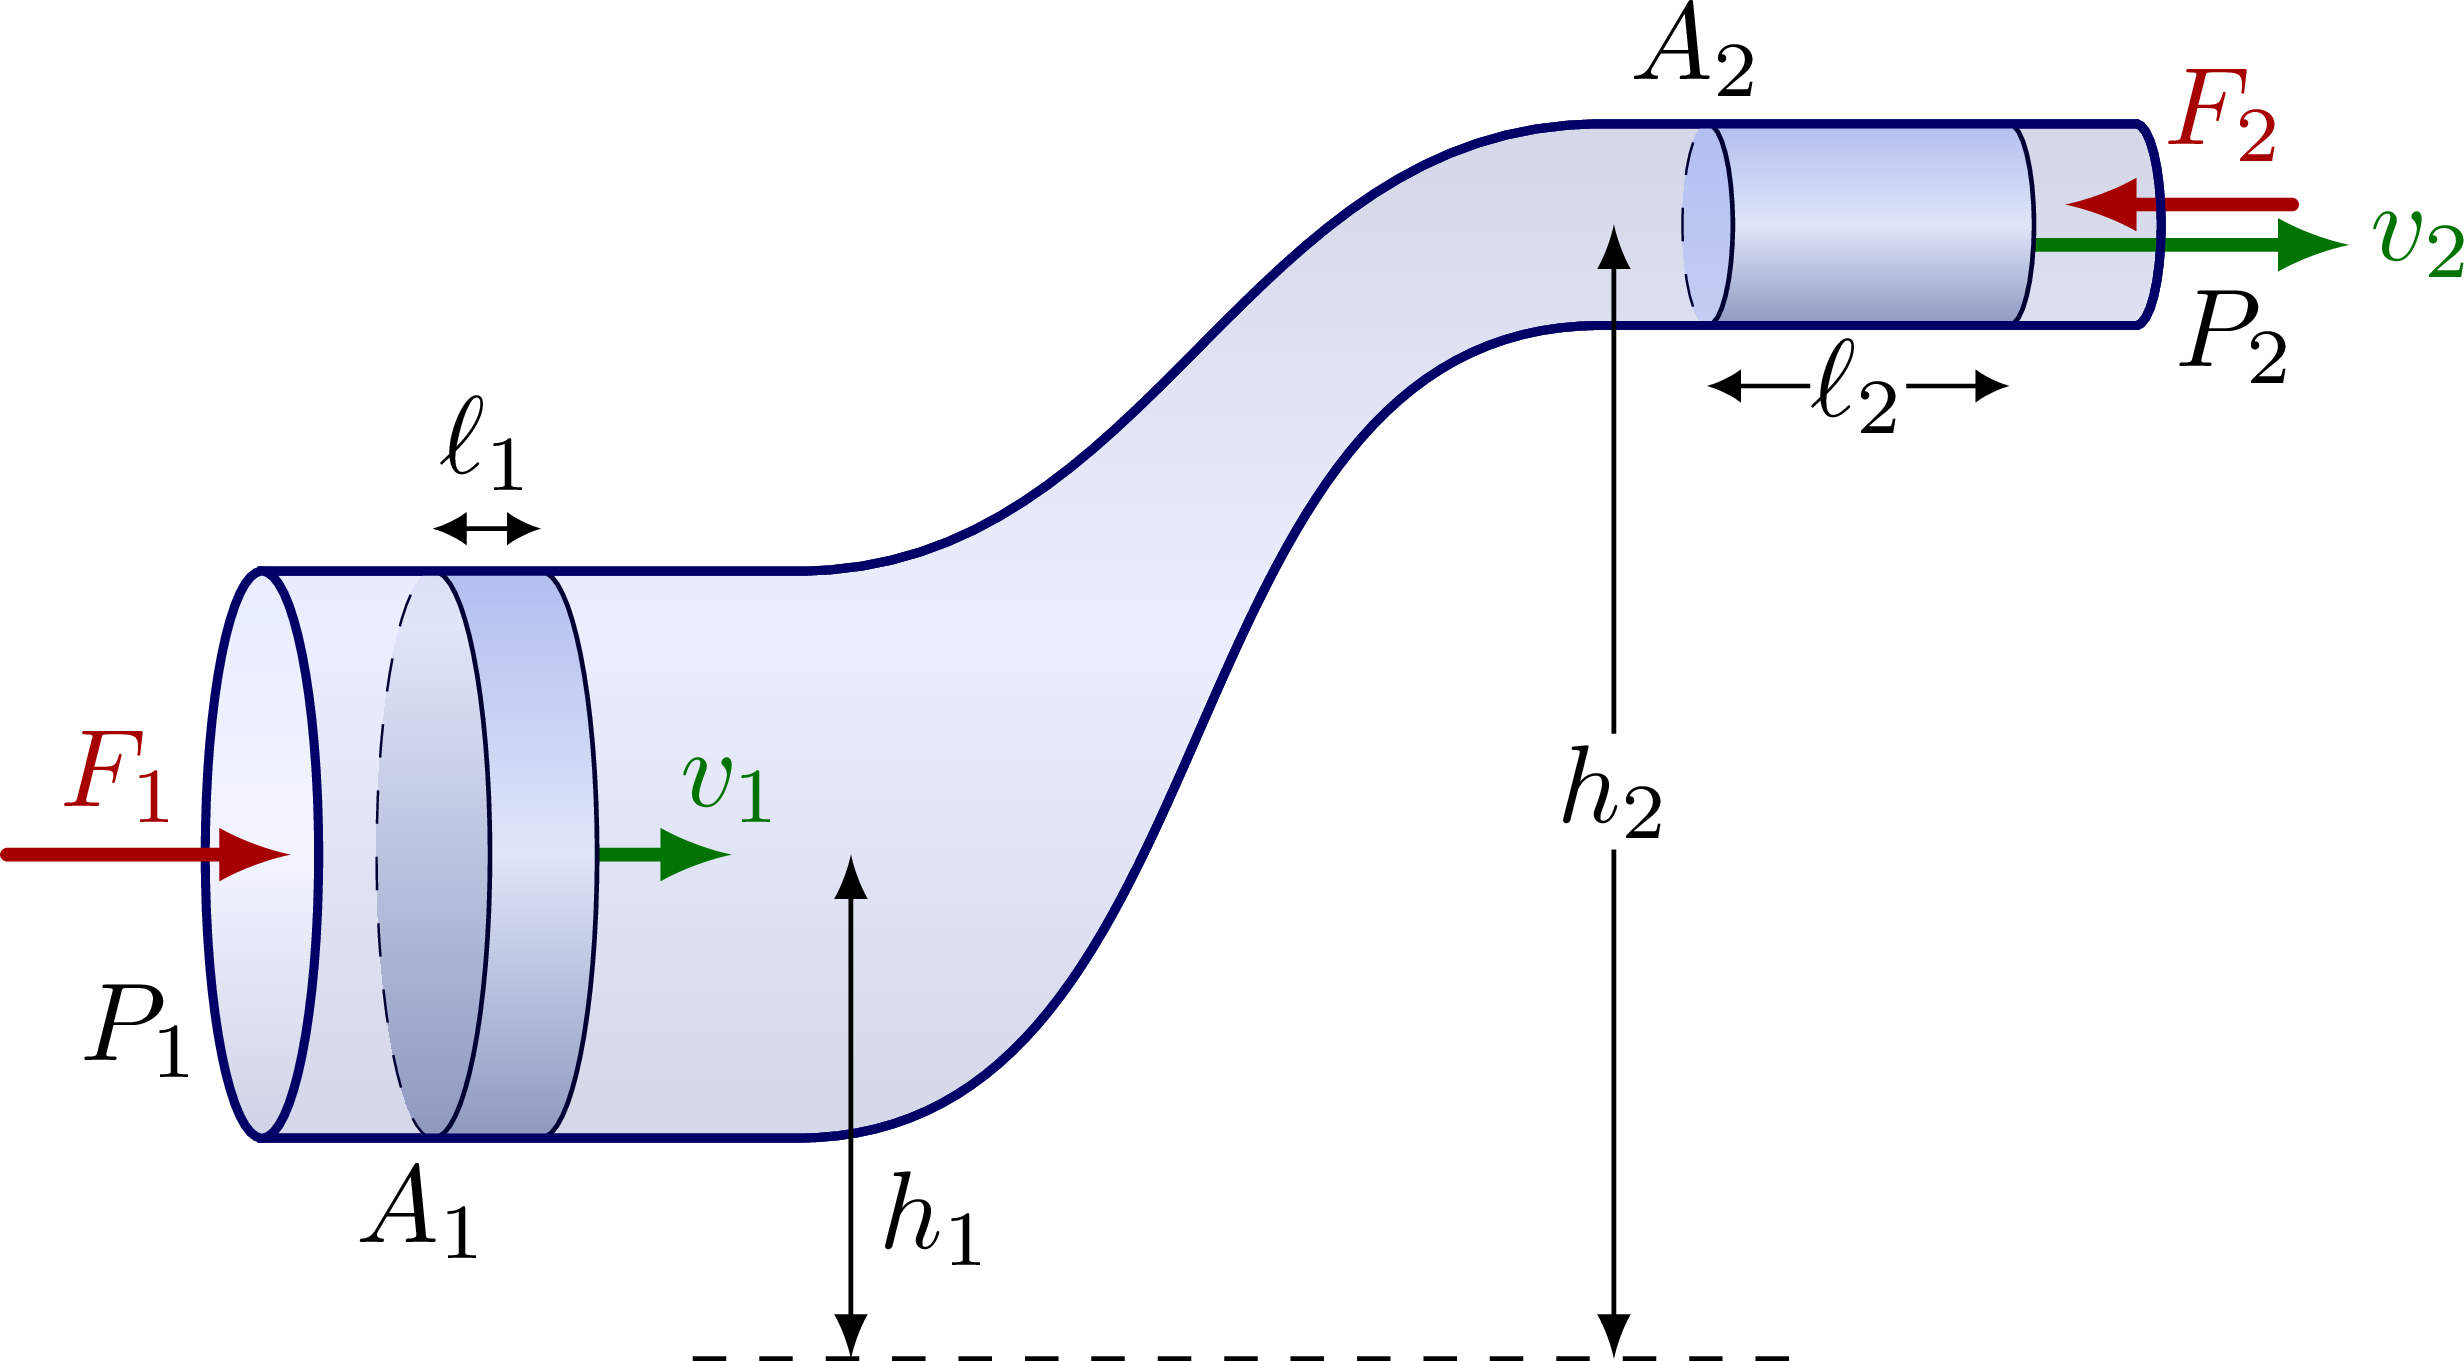 fluid_dynamics_bernouilli-002.png